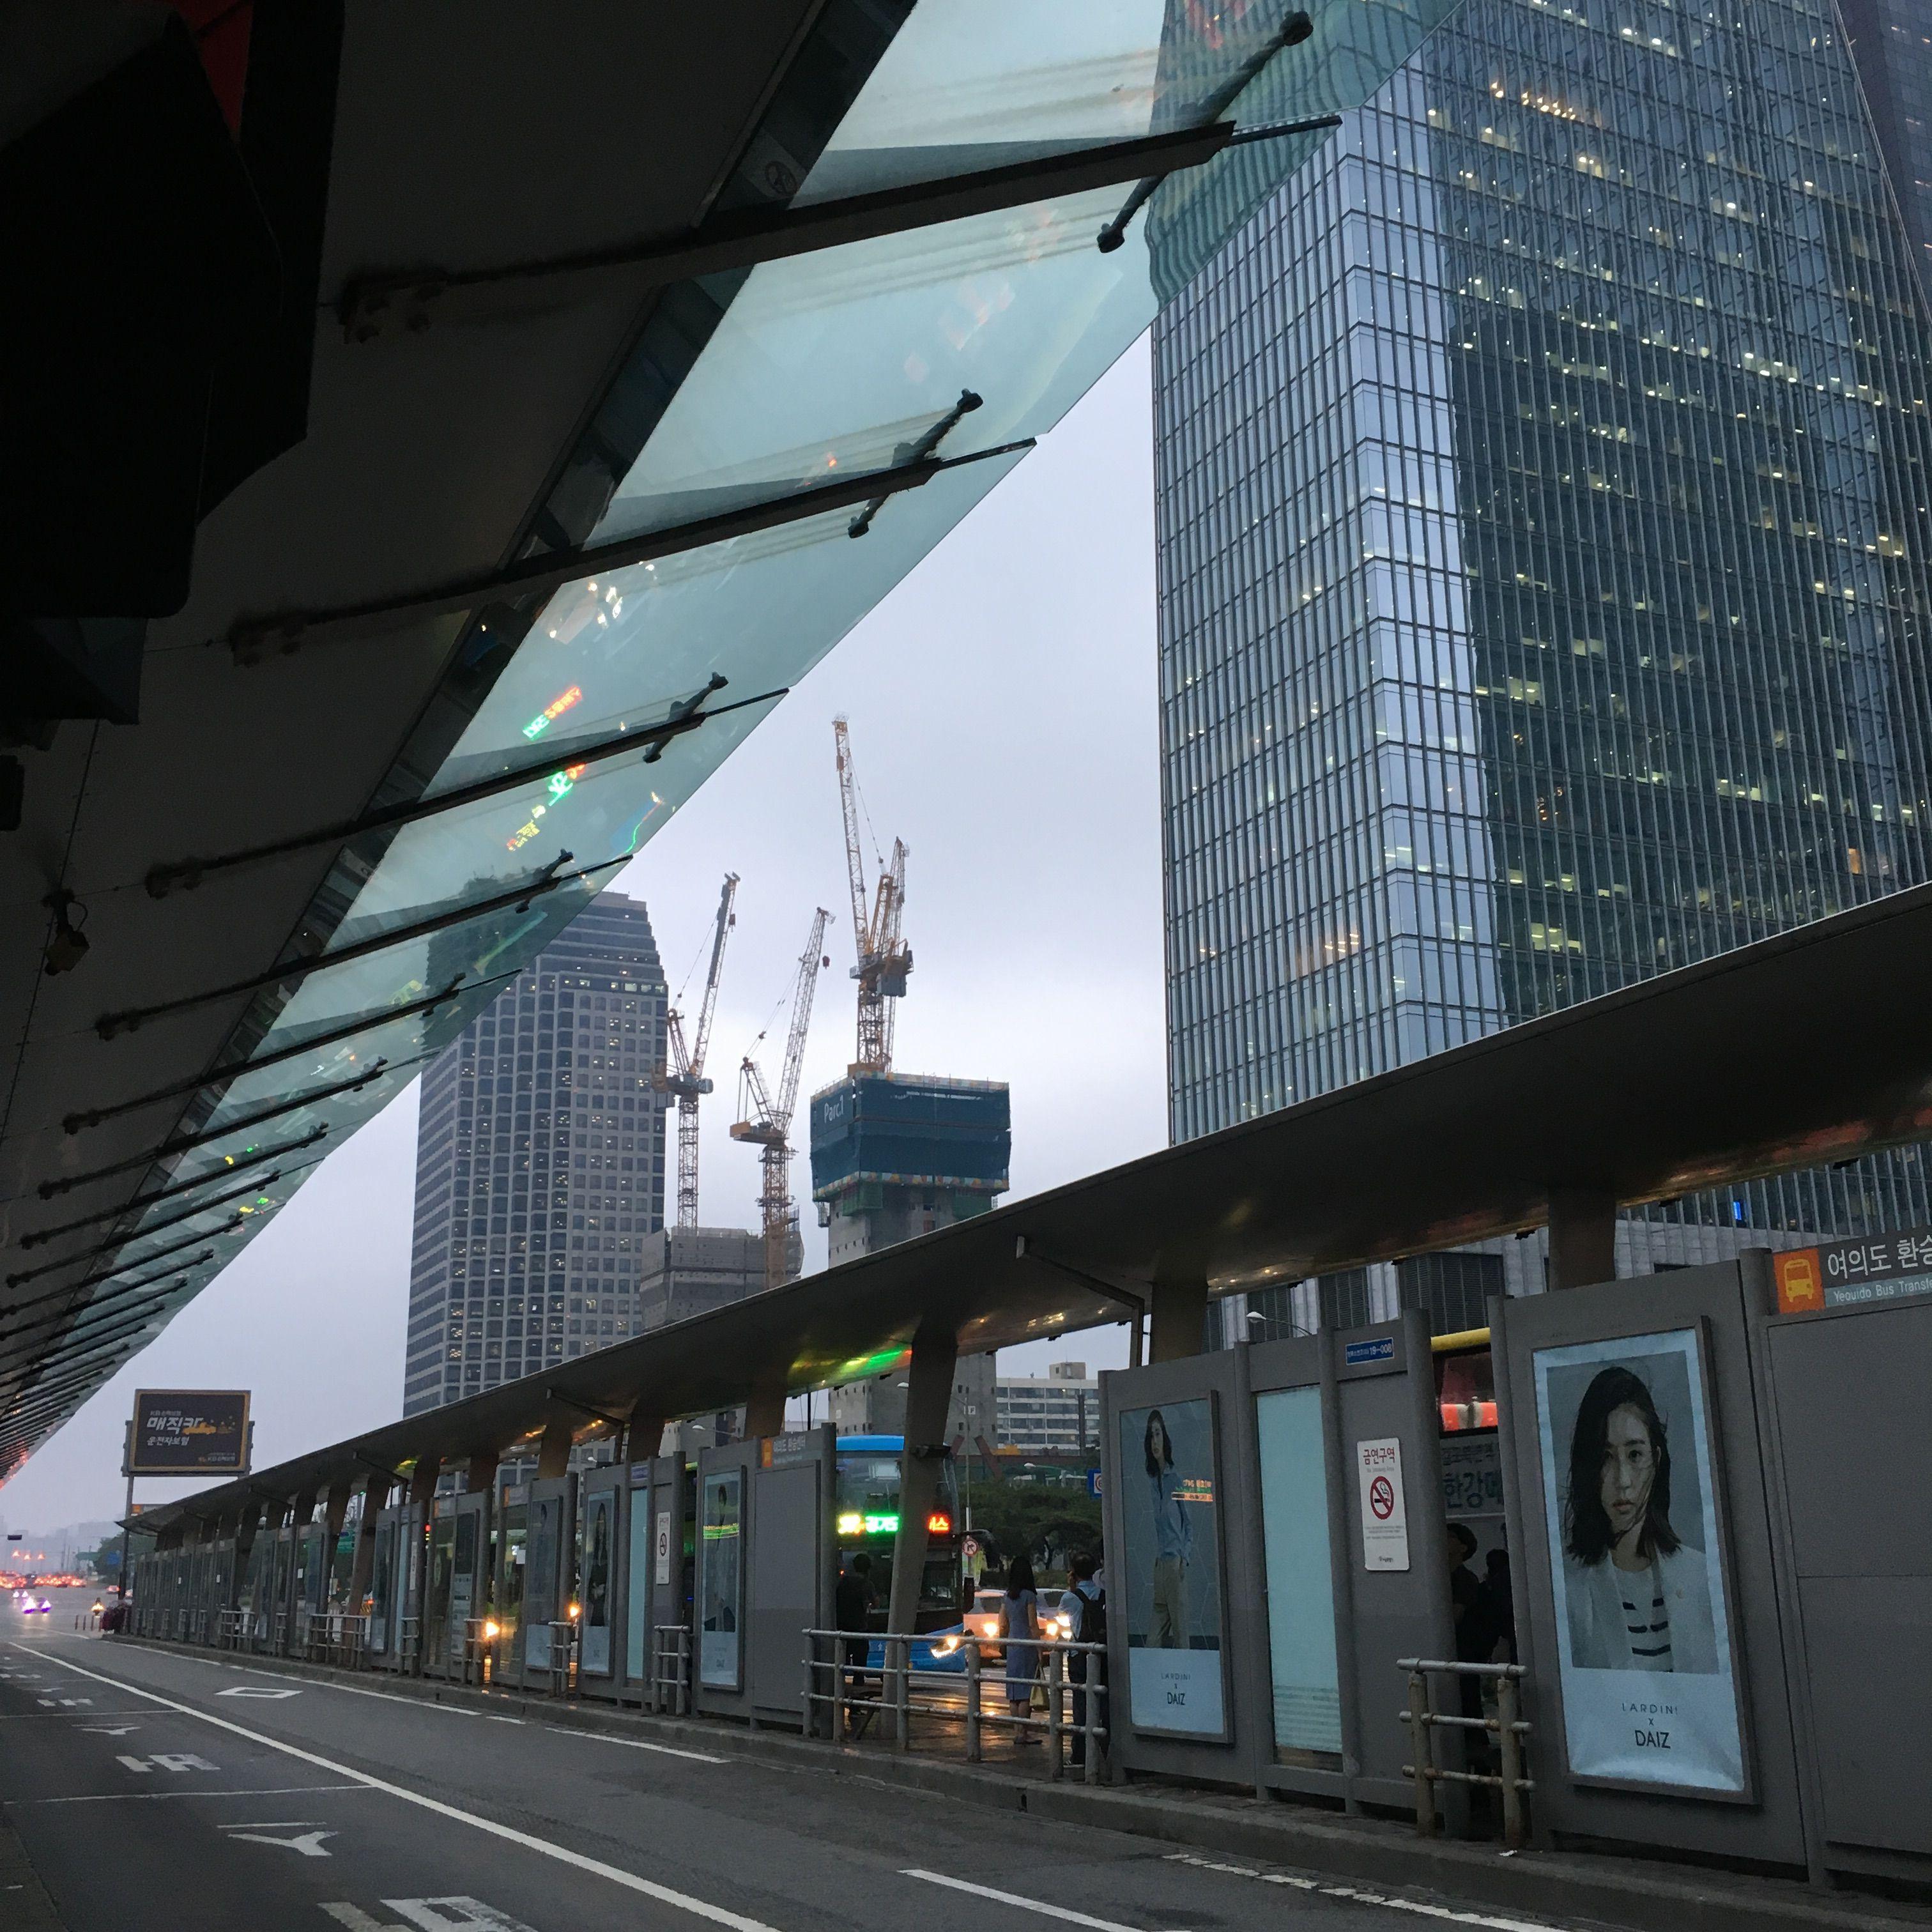 urban( 日 ) Road trip usa, City aesthetic, Trip